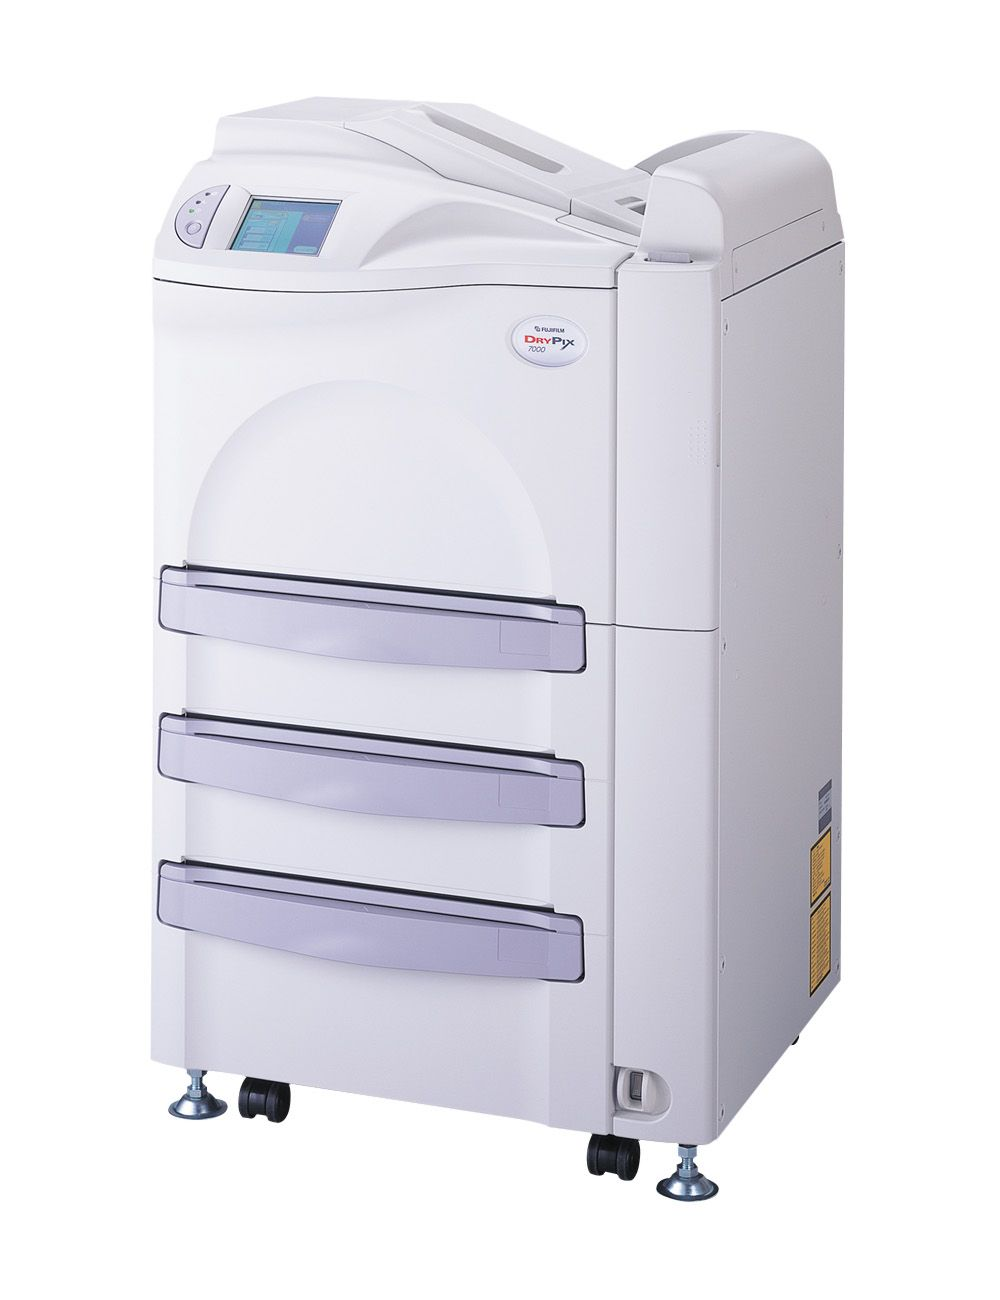 for sale printer fuji drypix 7000 3675 radiology equipment rh pinterest com  fuji drypix 6000 service manual